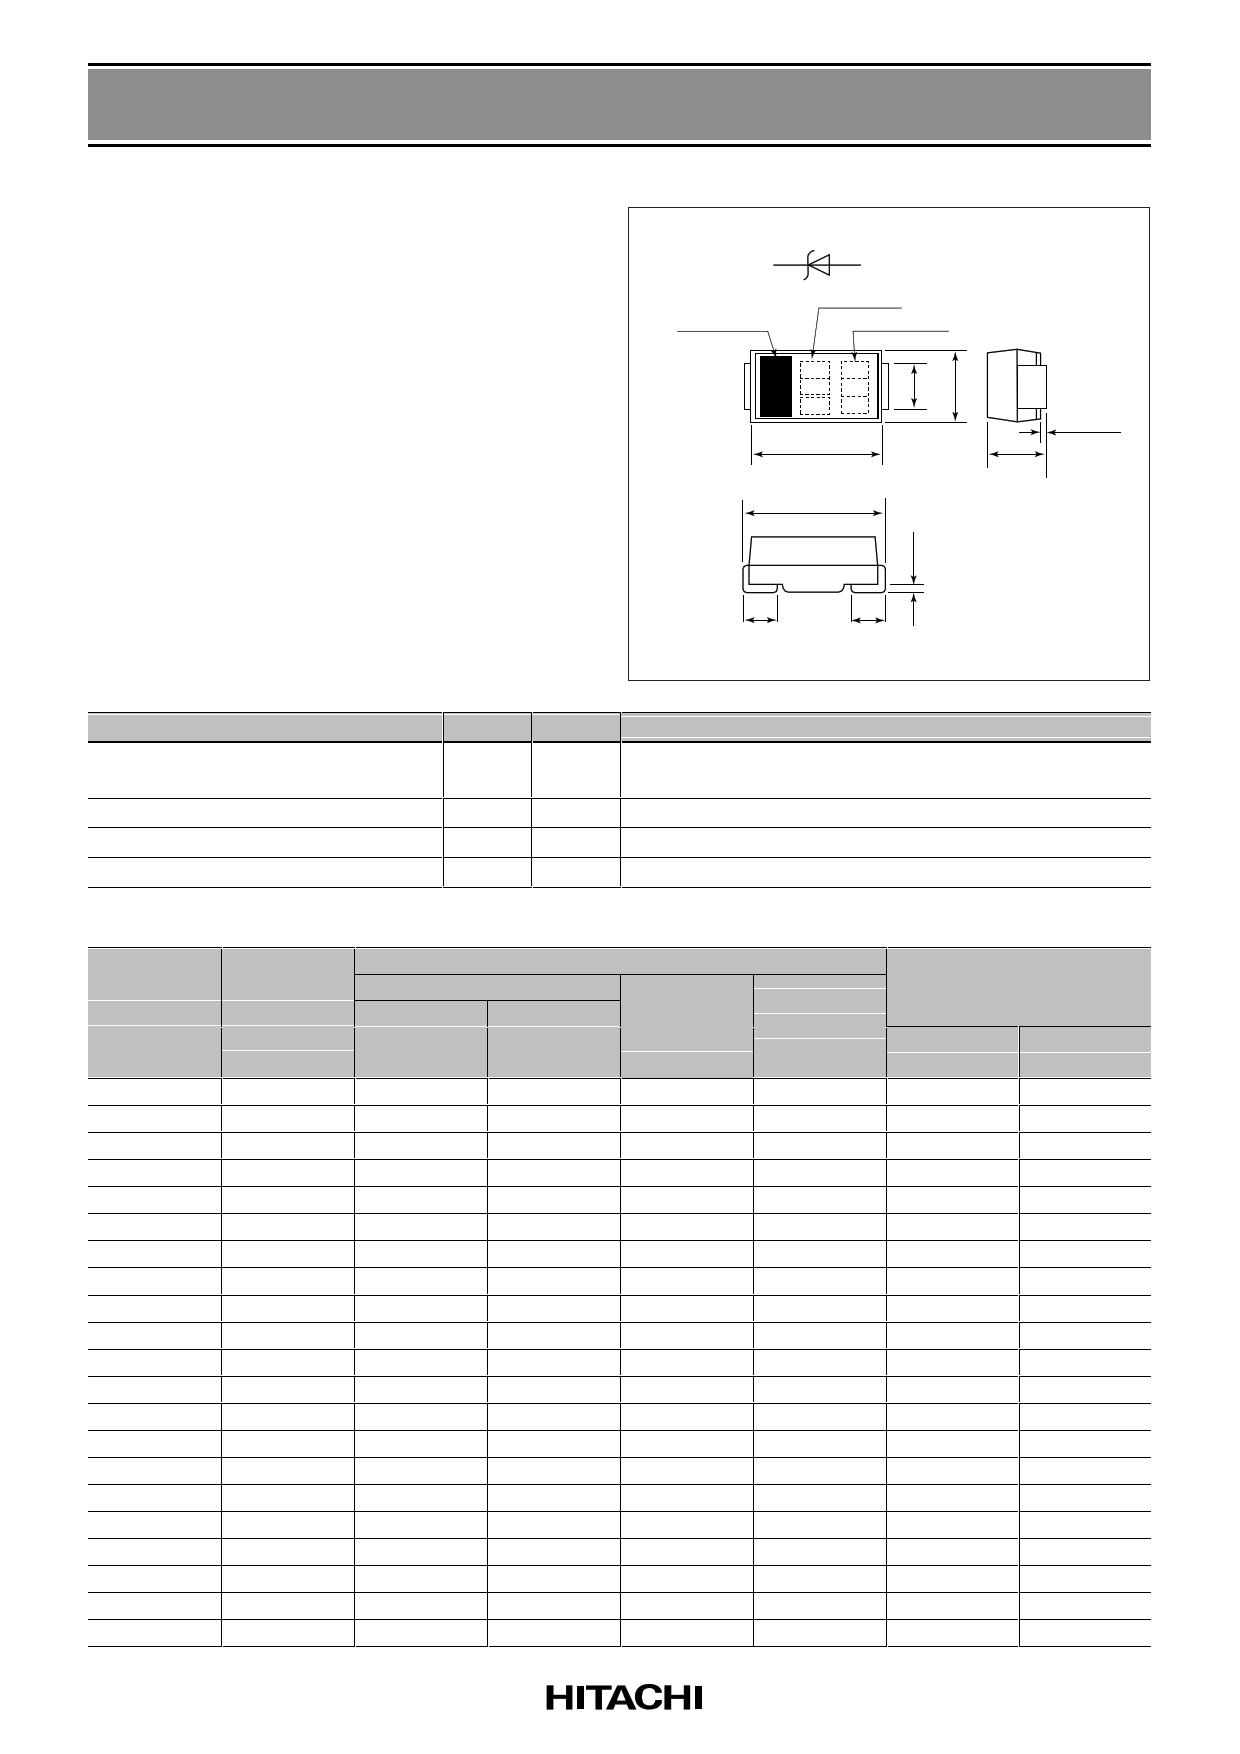 DAM3MA36 데이터시트 및 DAM3MA36 PDF